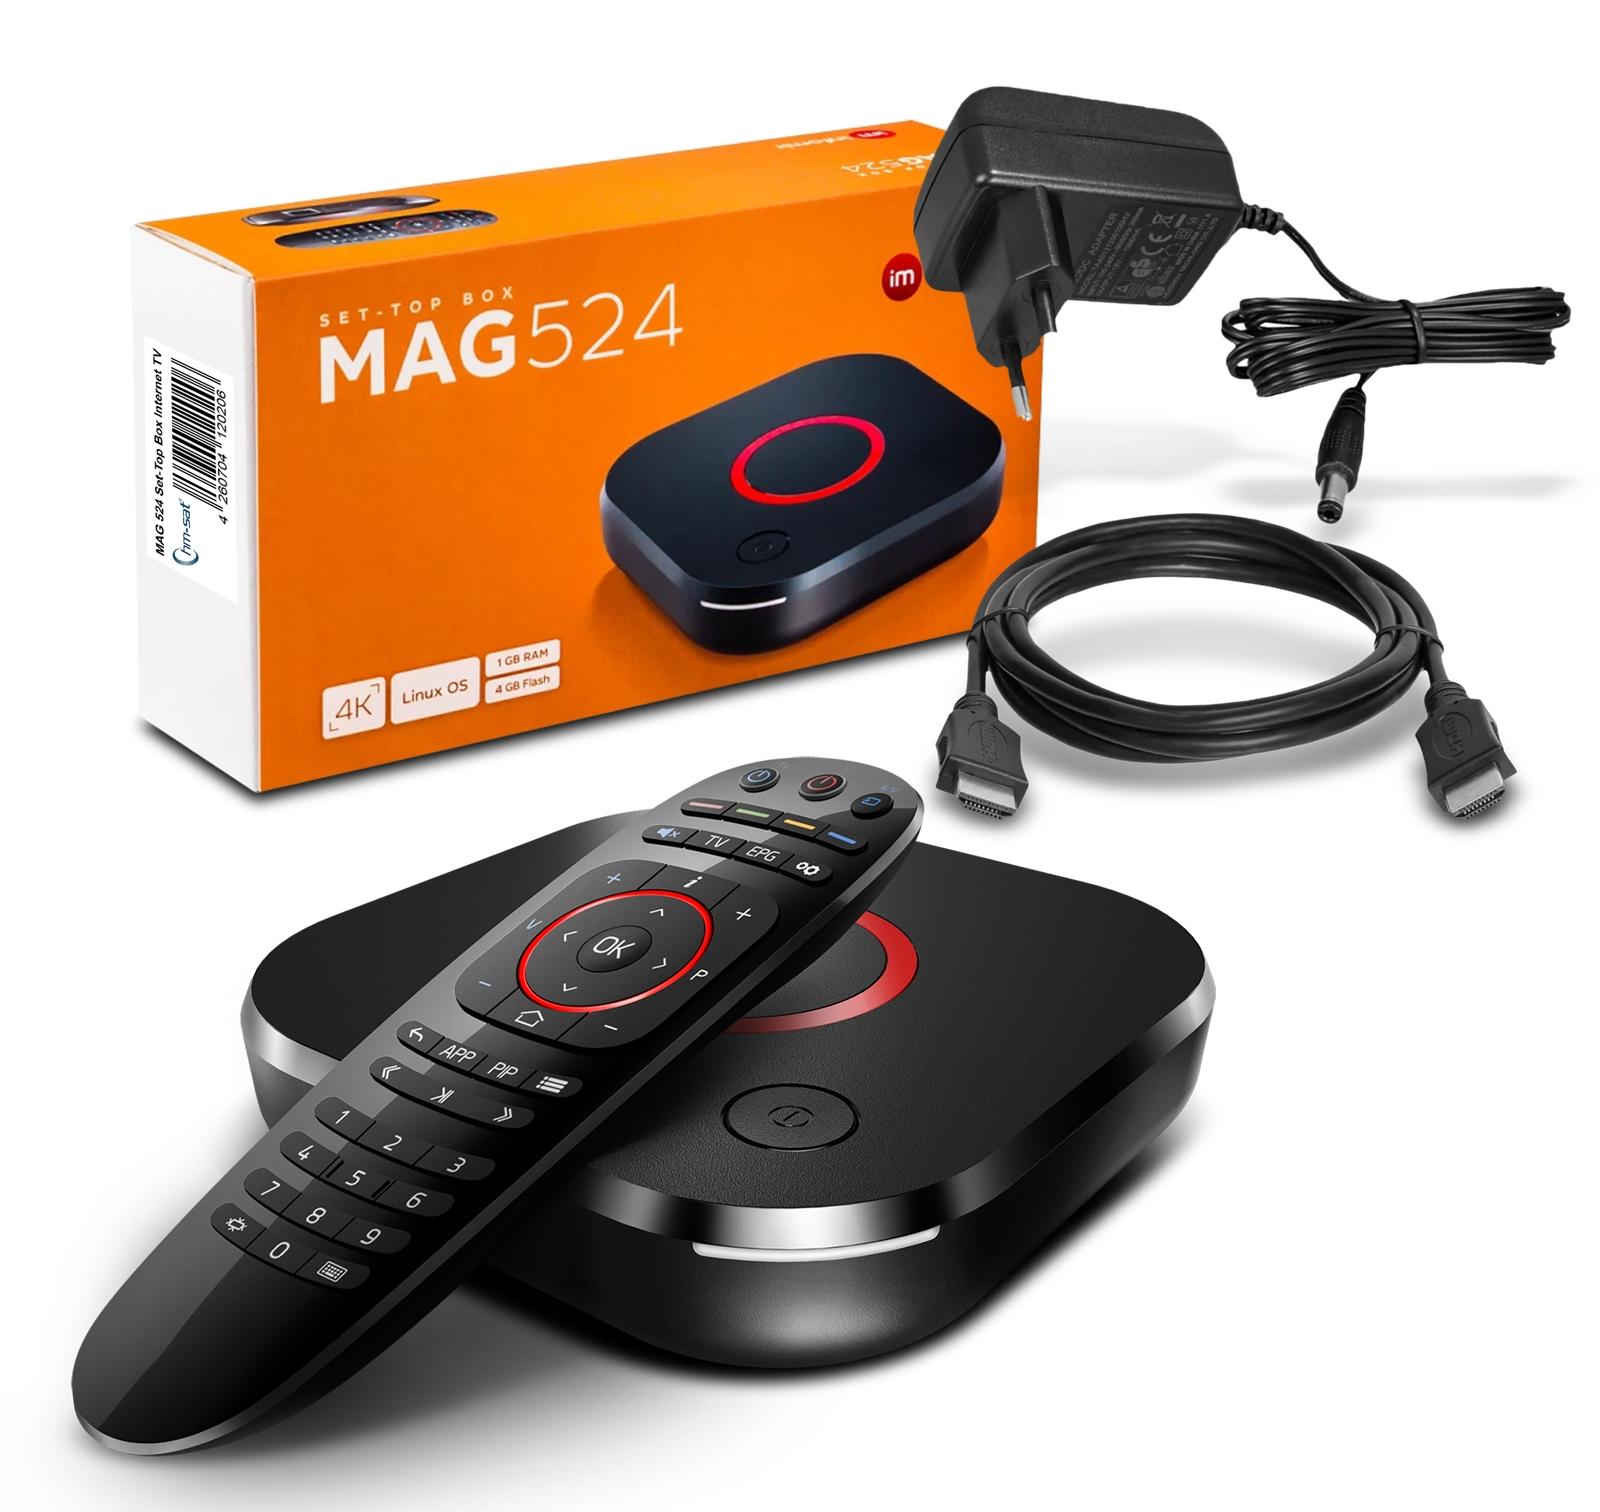 MAG 524 IP TV Internet Streamer HEVC H.265 4K UHD 60FPS Linux USB 3.0 LAN HDMI